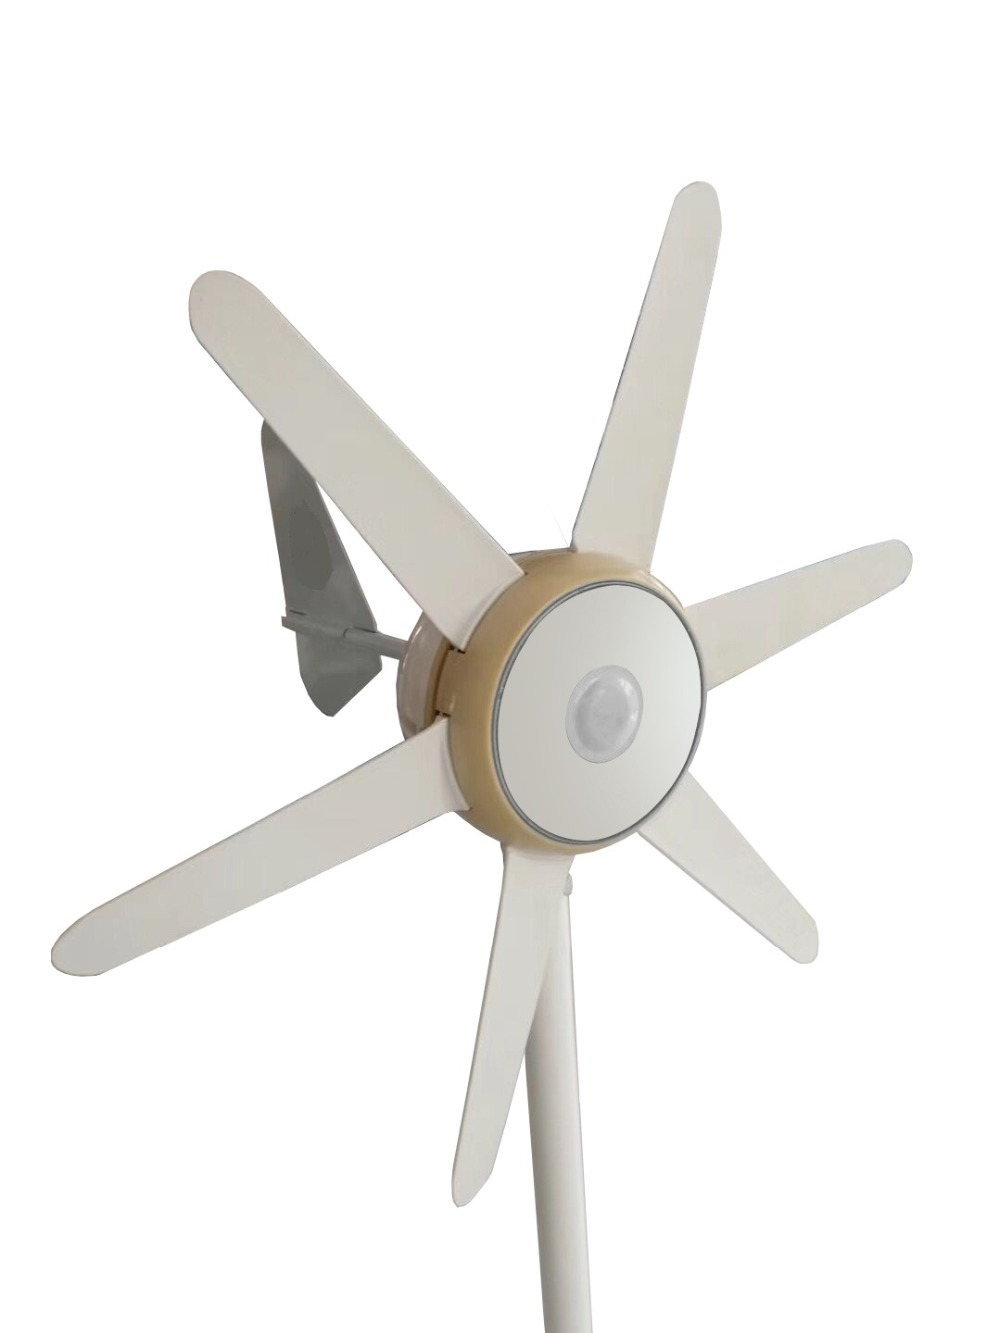 M 300 6 blades 150W Power DC 12V 24V Wind Energy Turbine Generator winder driven for